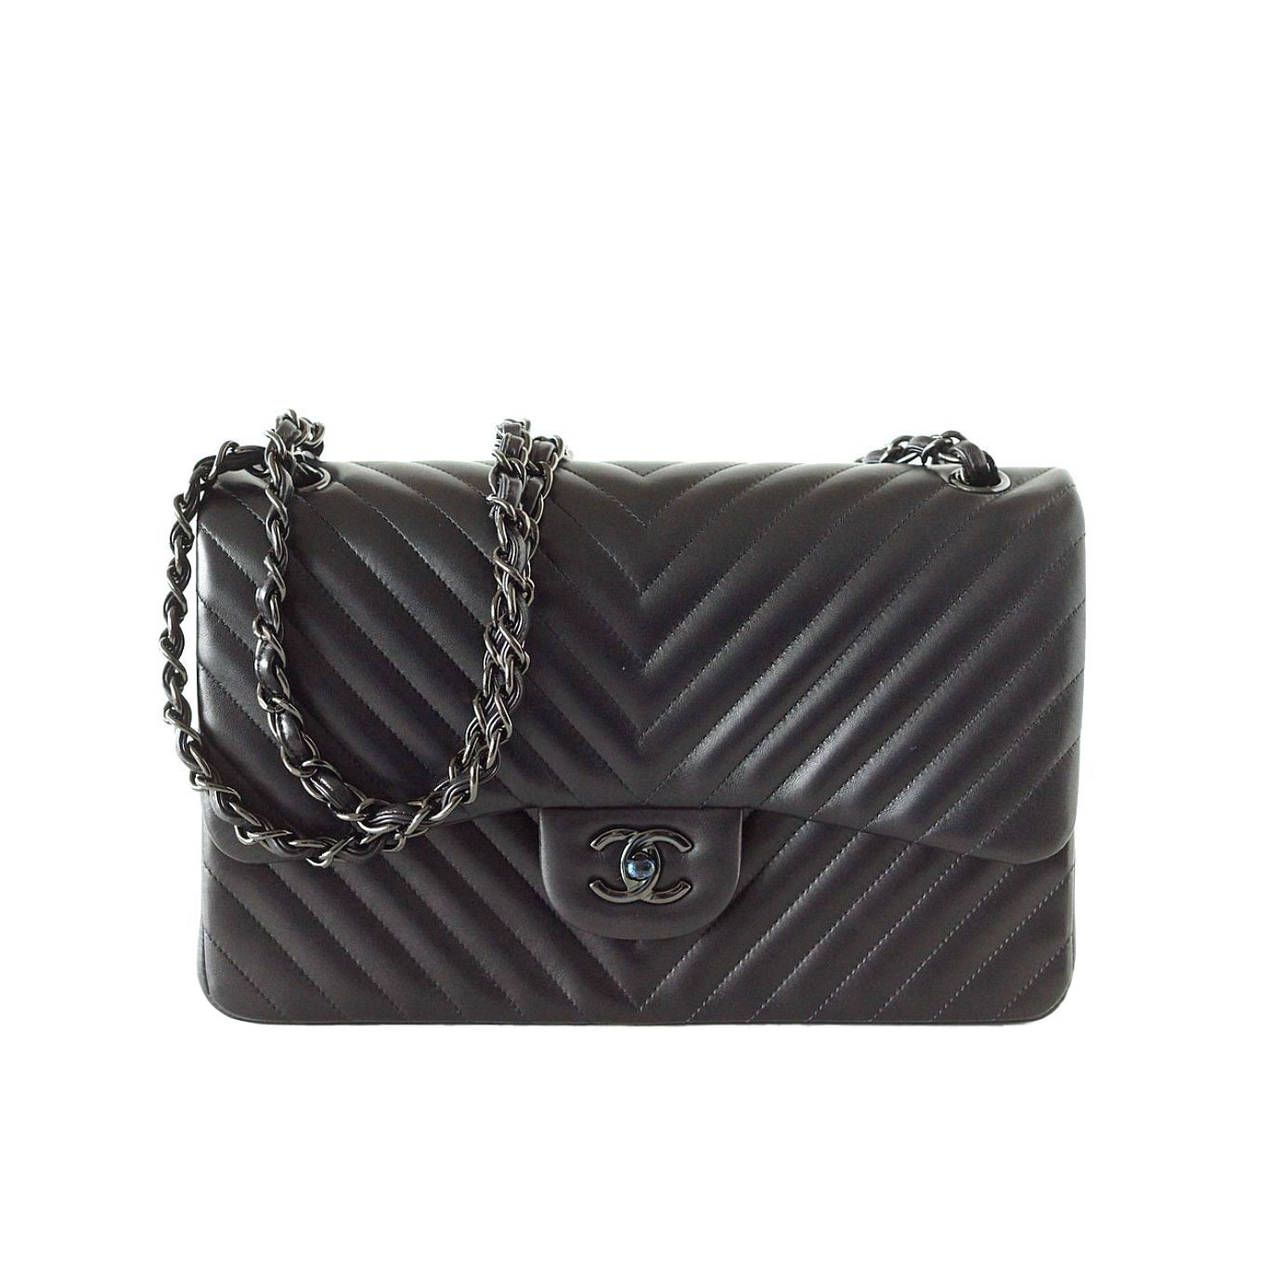 Chanel handbag superb vintage chanel bag vintage leather - Bag Chanel Bag Chevron So Black Jumbo Classic Double Flap